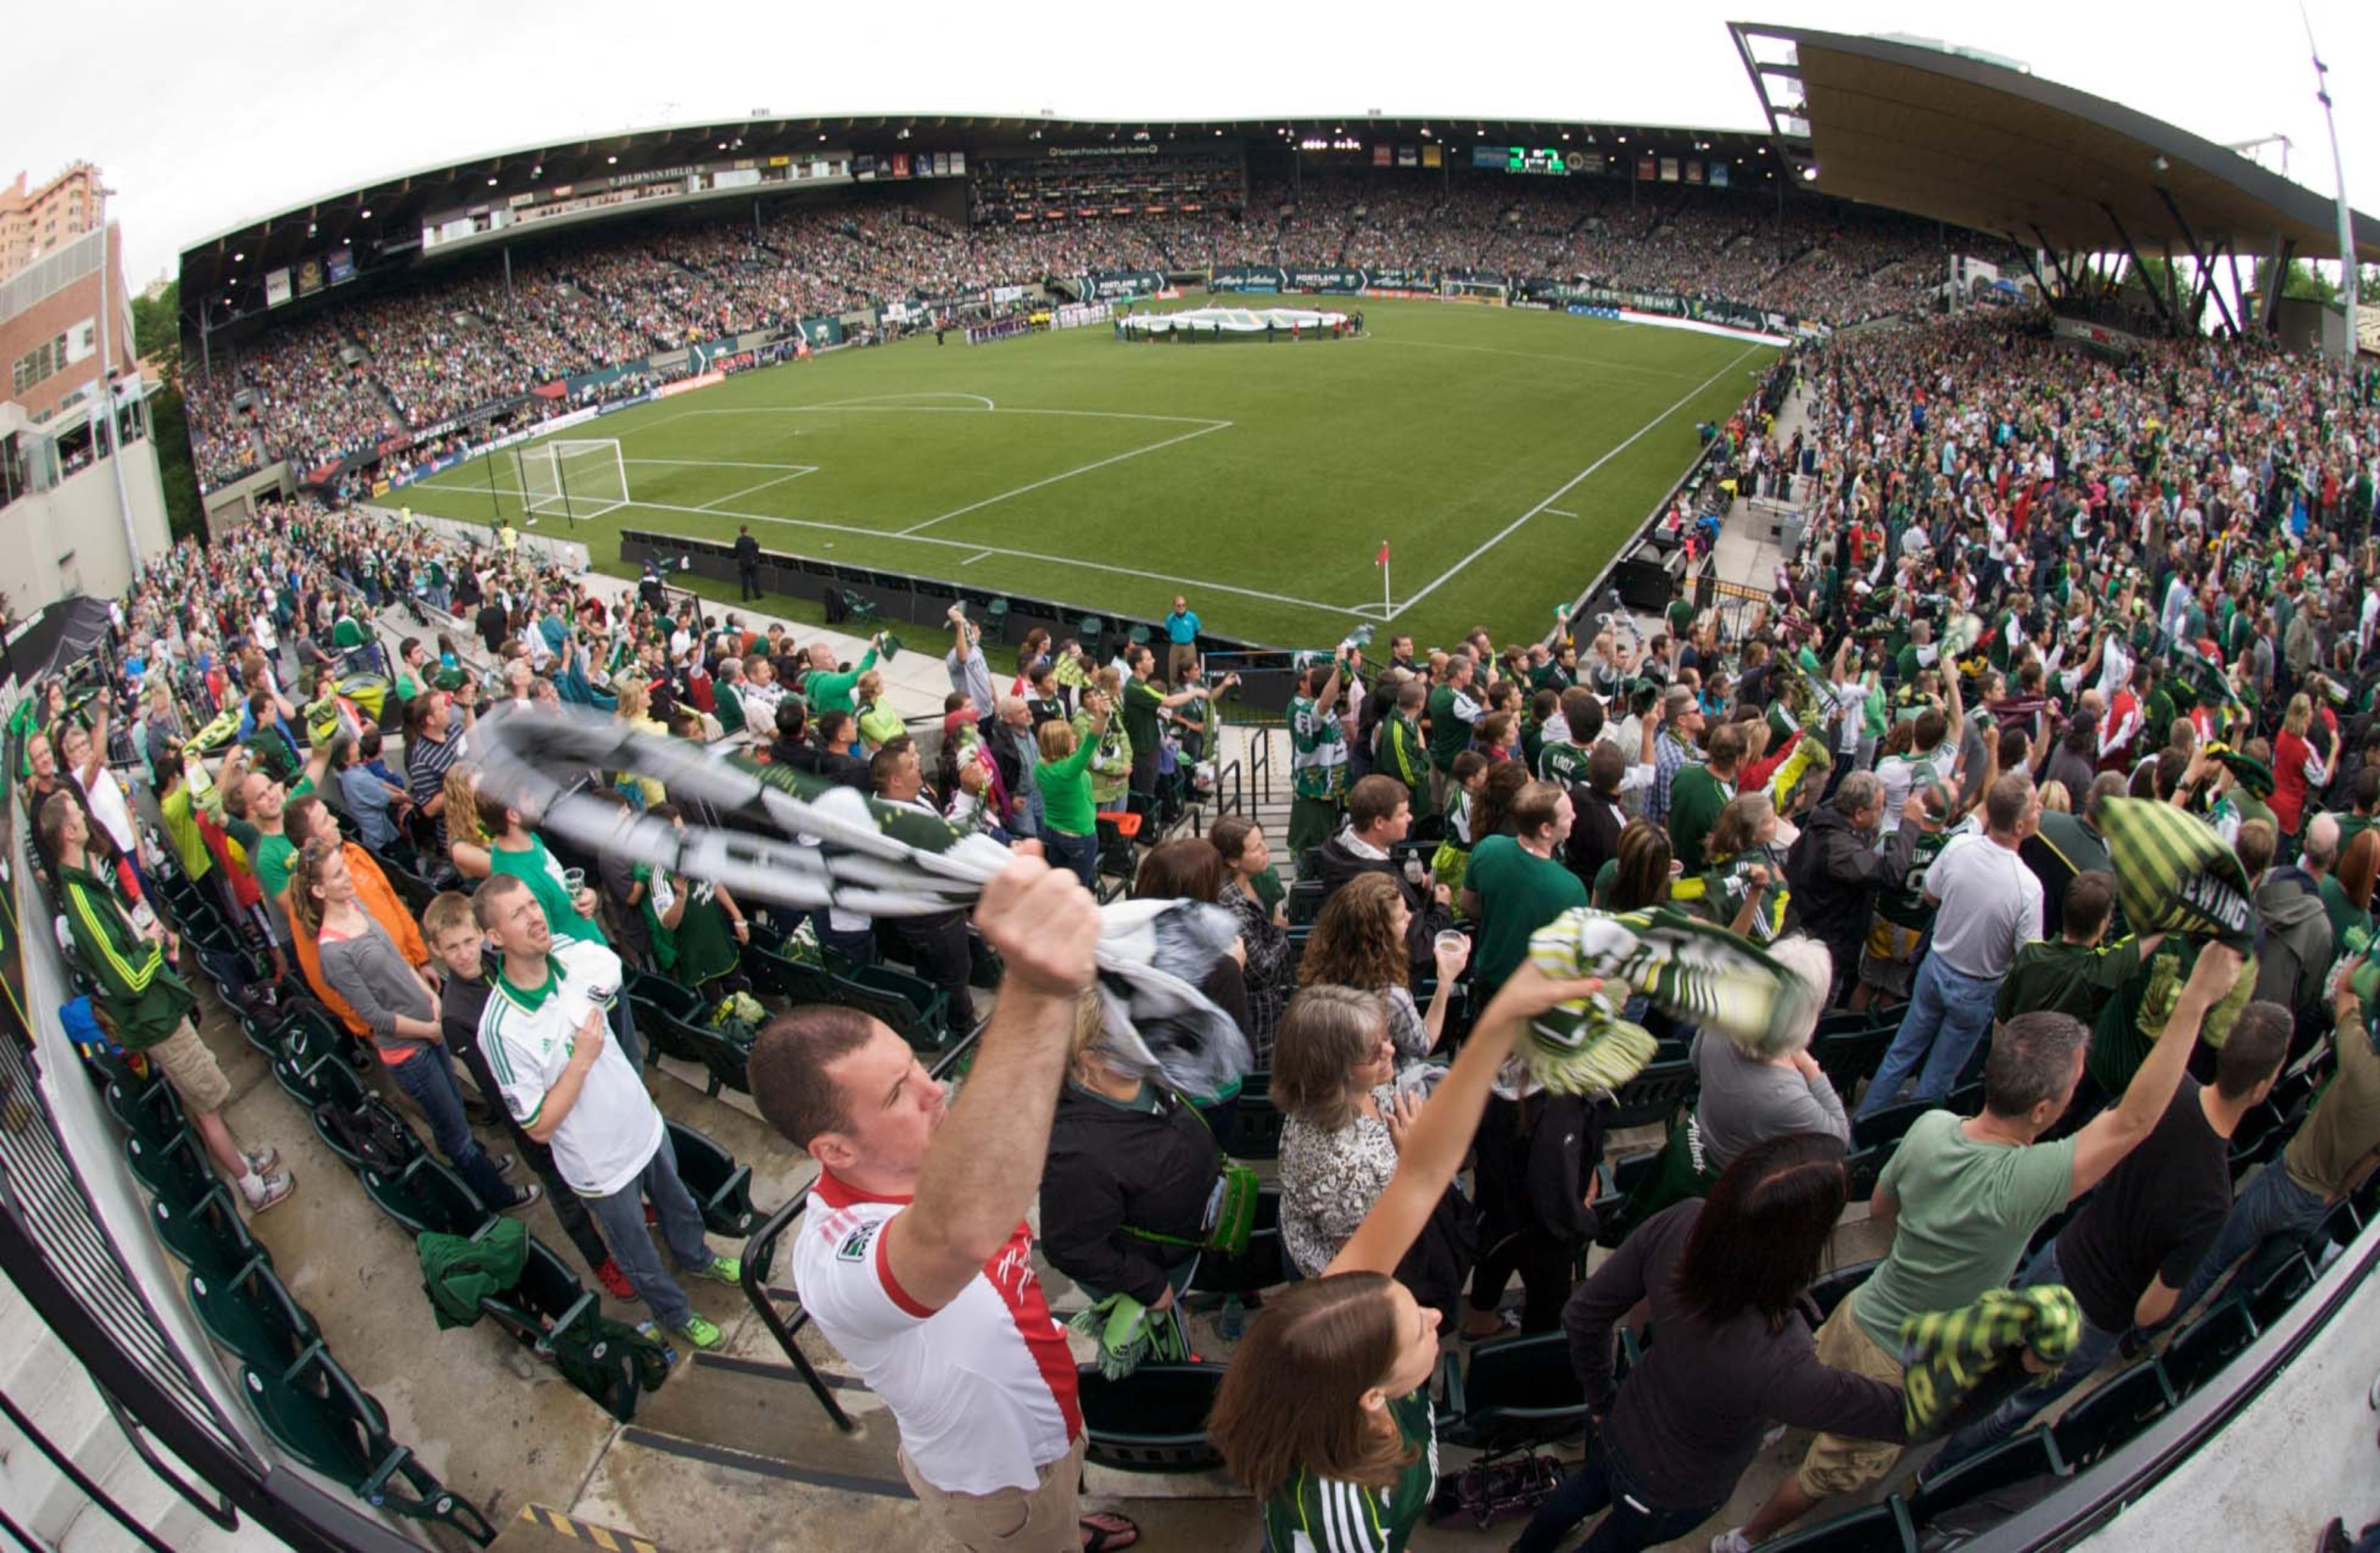 Portland Timber MLS fans